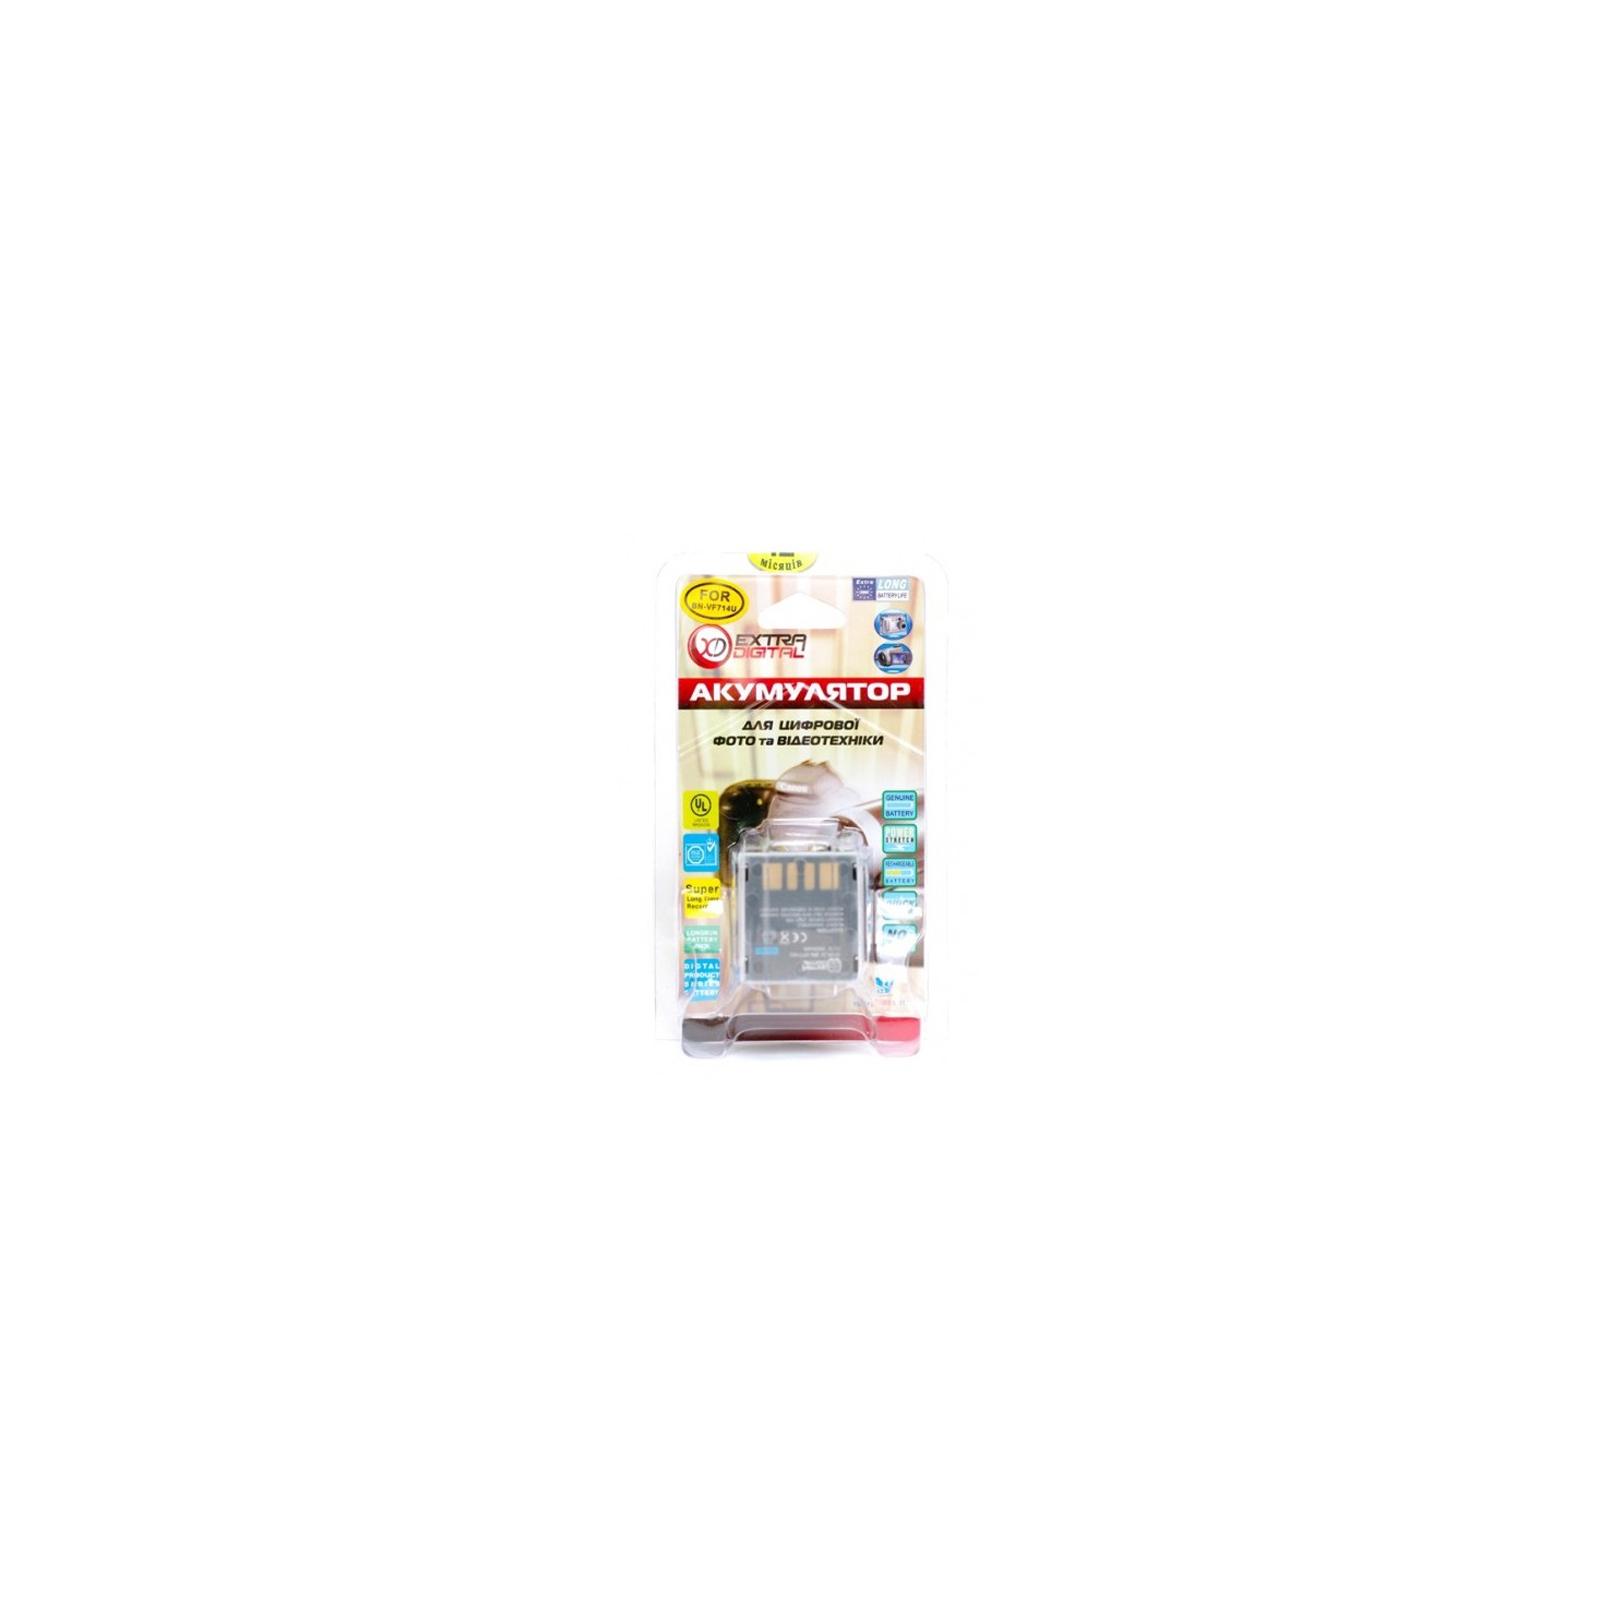 Аккумулятор к фото/видео EXTRADIGITAL JVC BN-VF714U (DV00DV1179) изображение 3